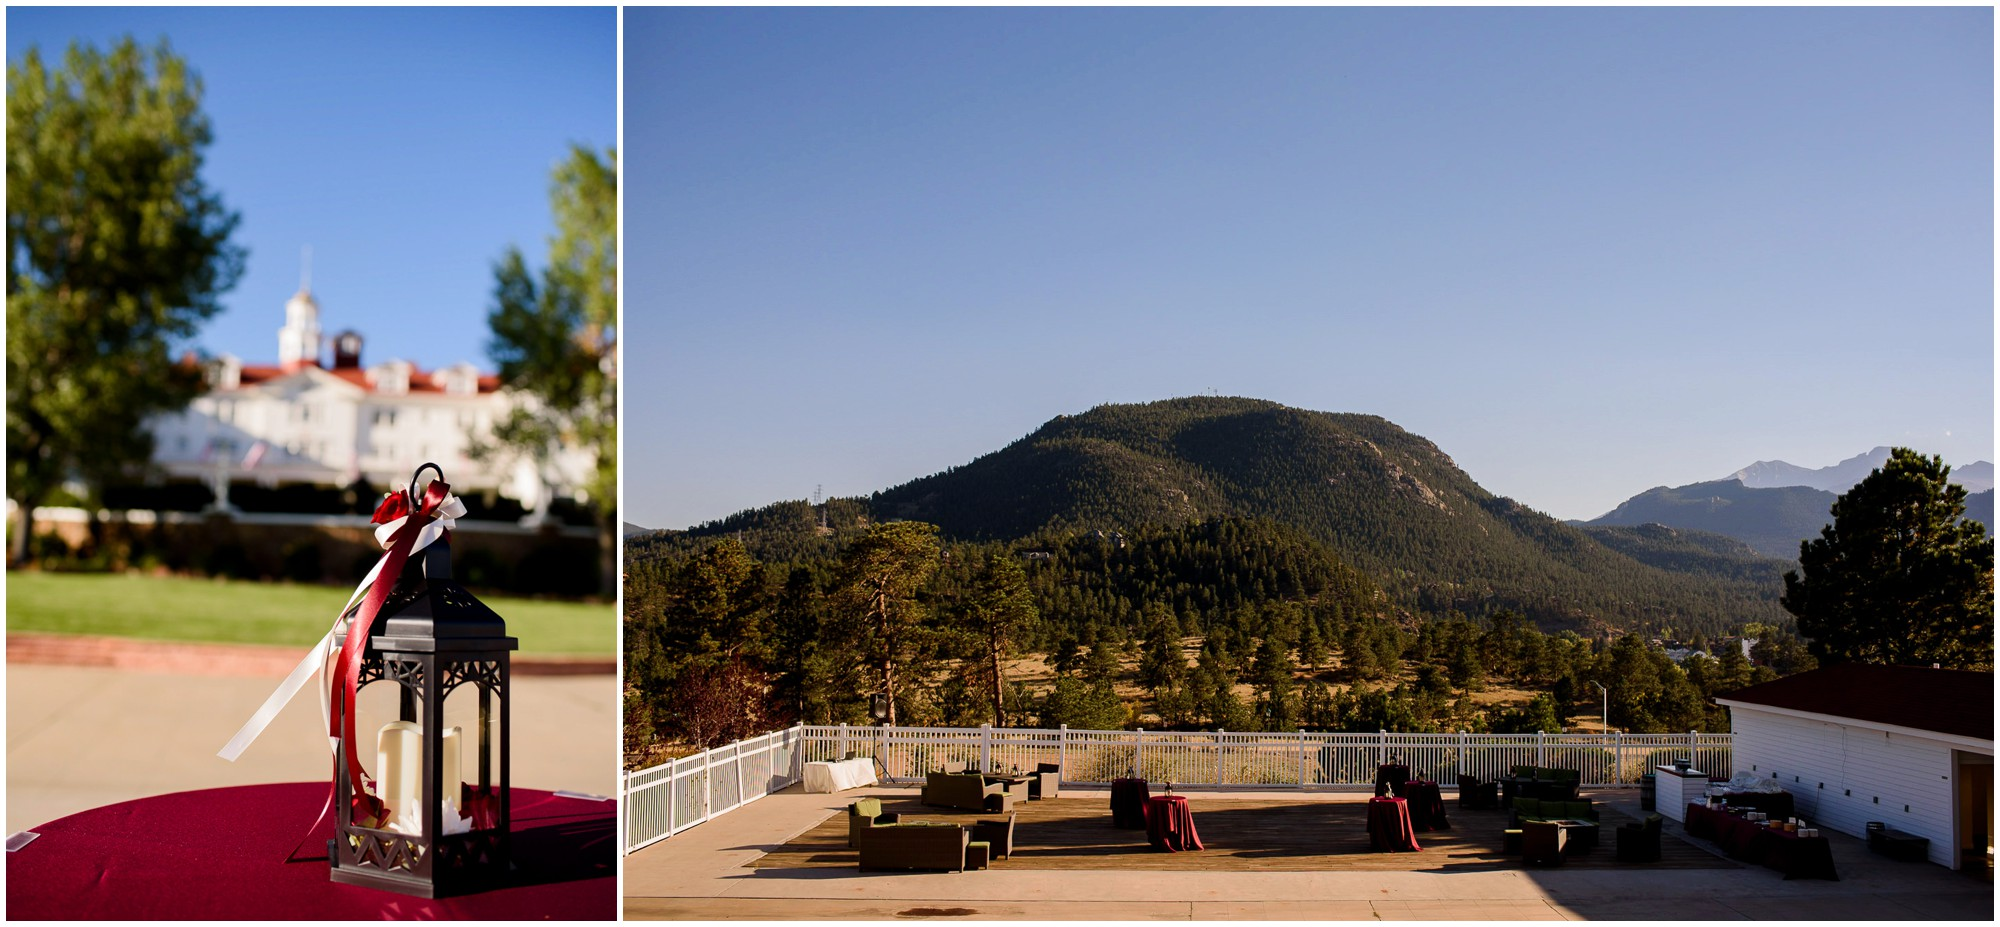 128-Estes-Park-Stanley-hotel-fall-wedding.jpg